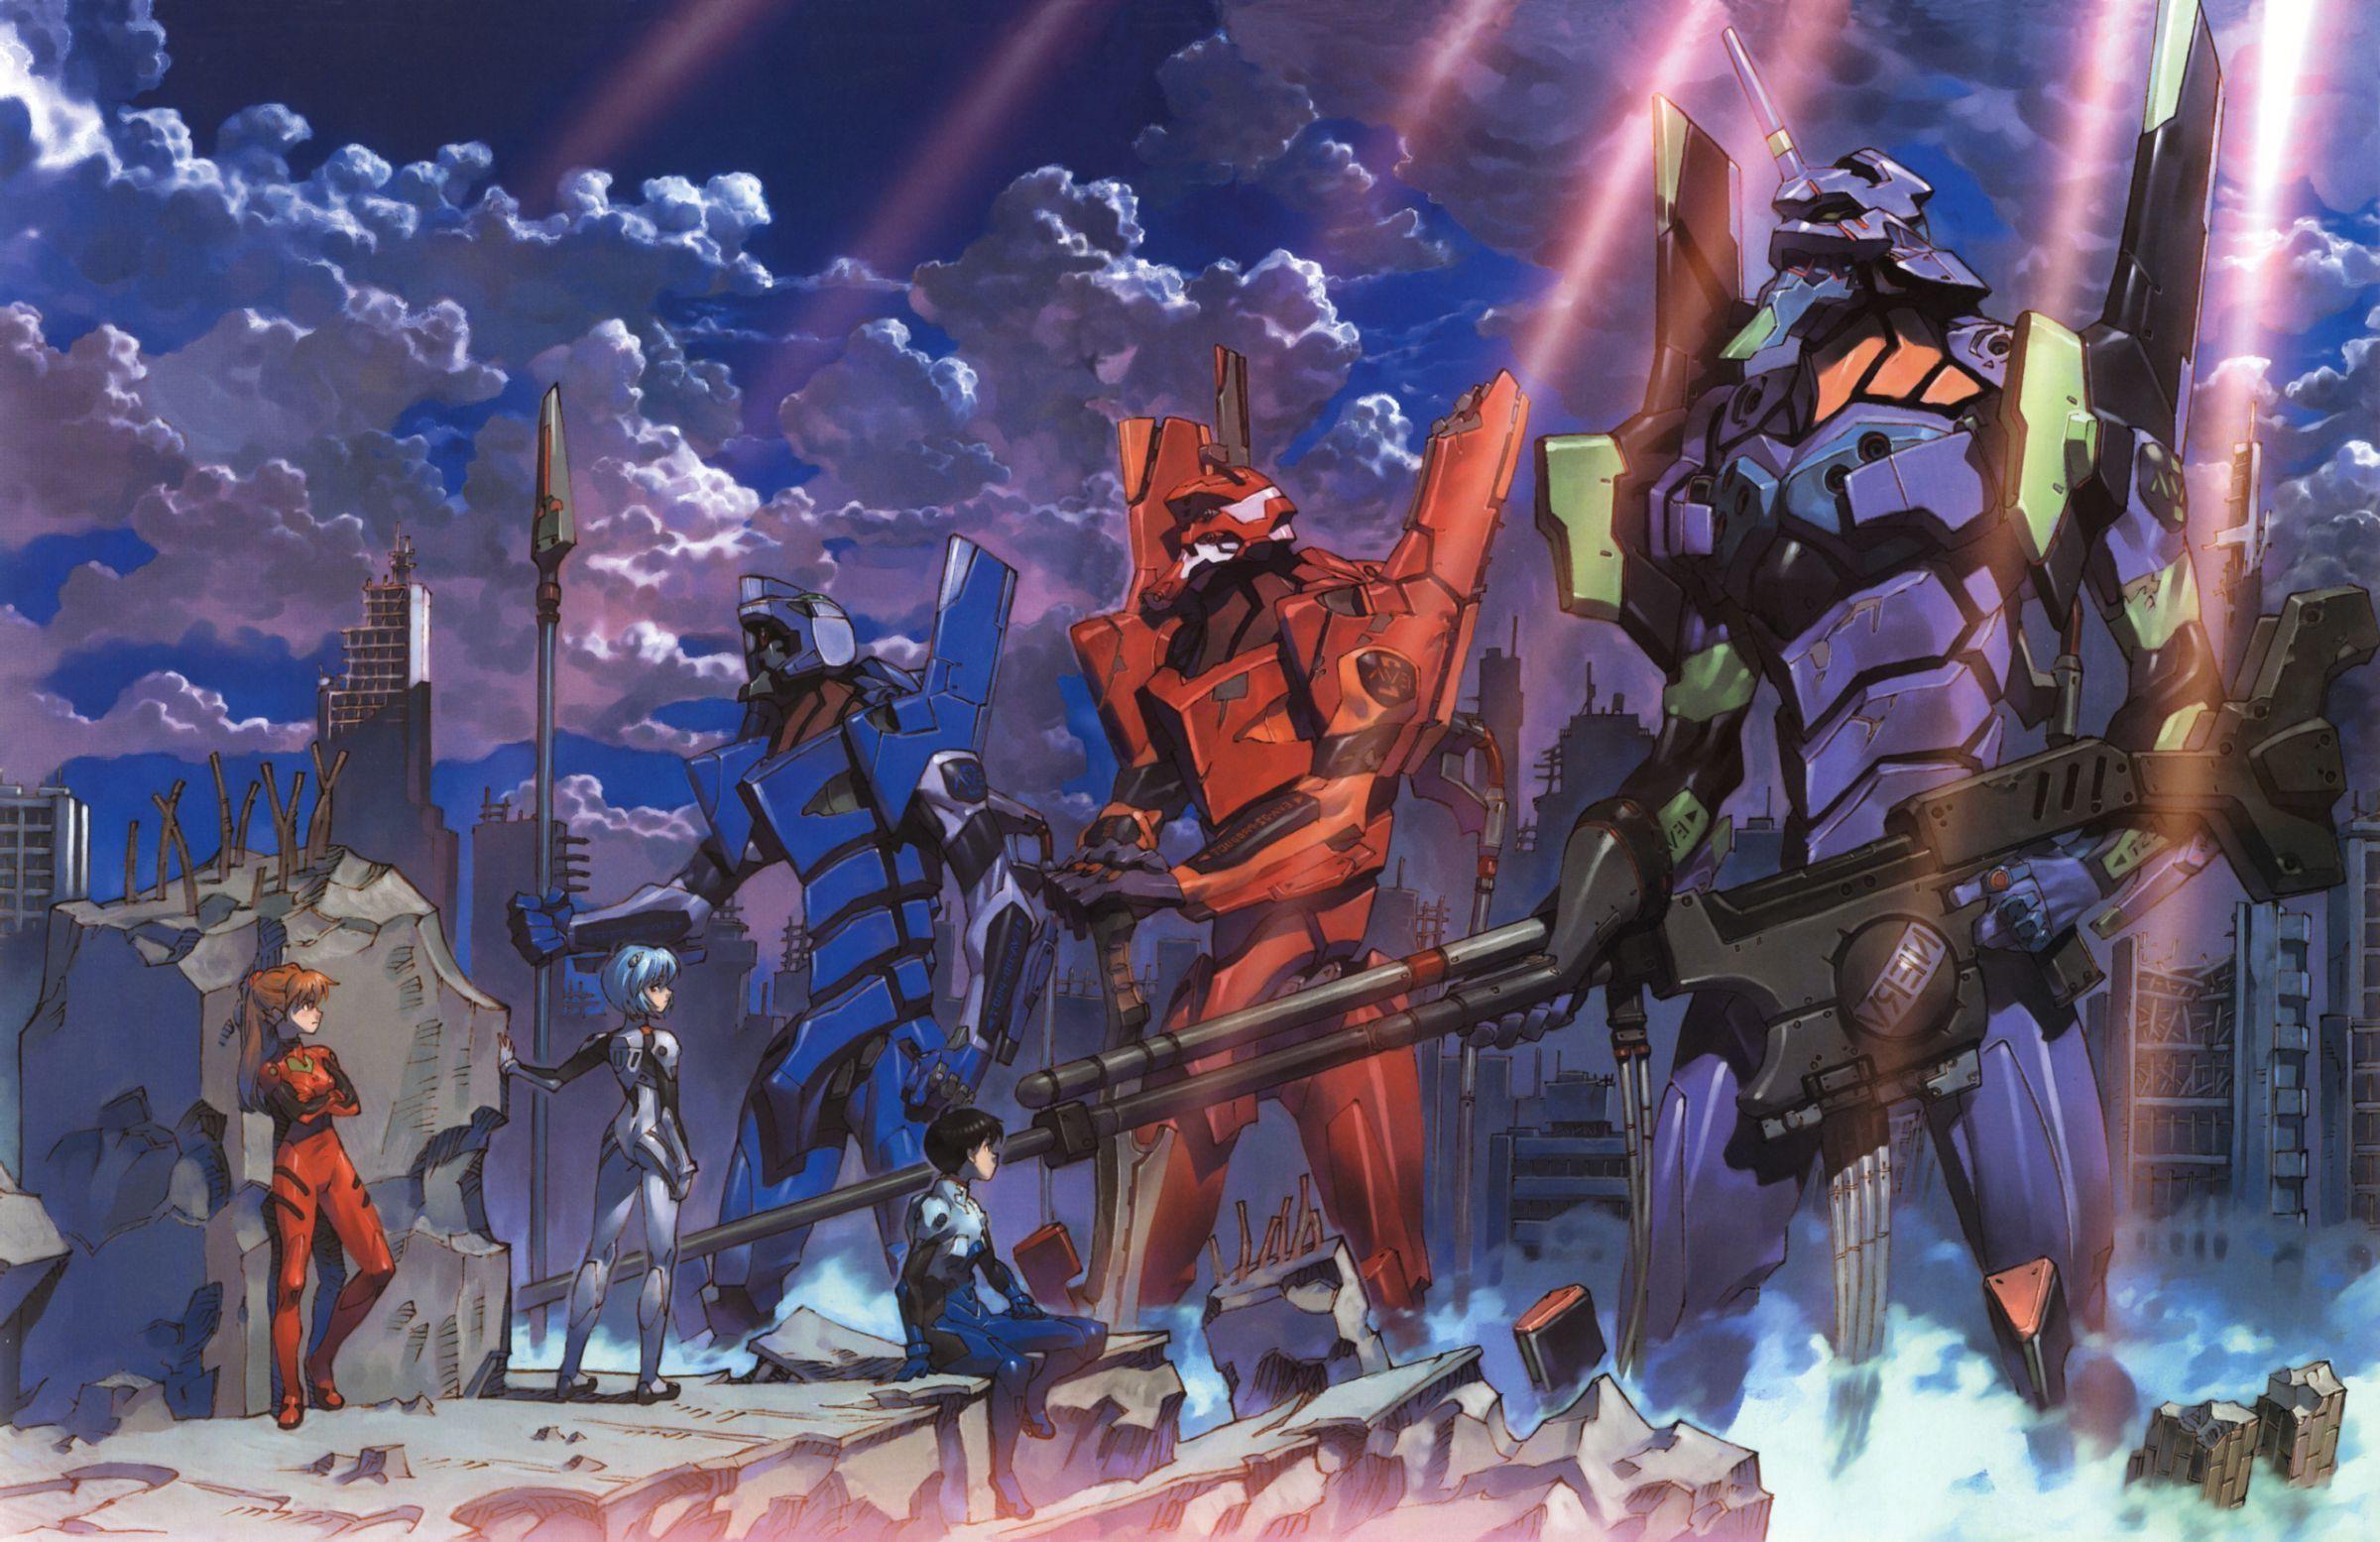 Neon Genesis Evangelion wallpaper ·① Download free full HD ...